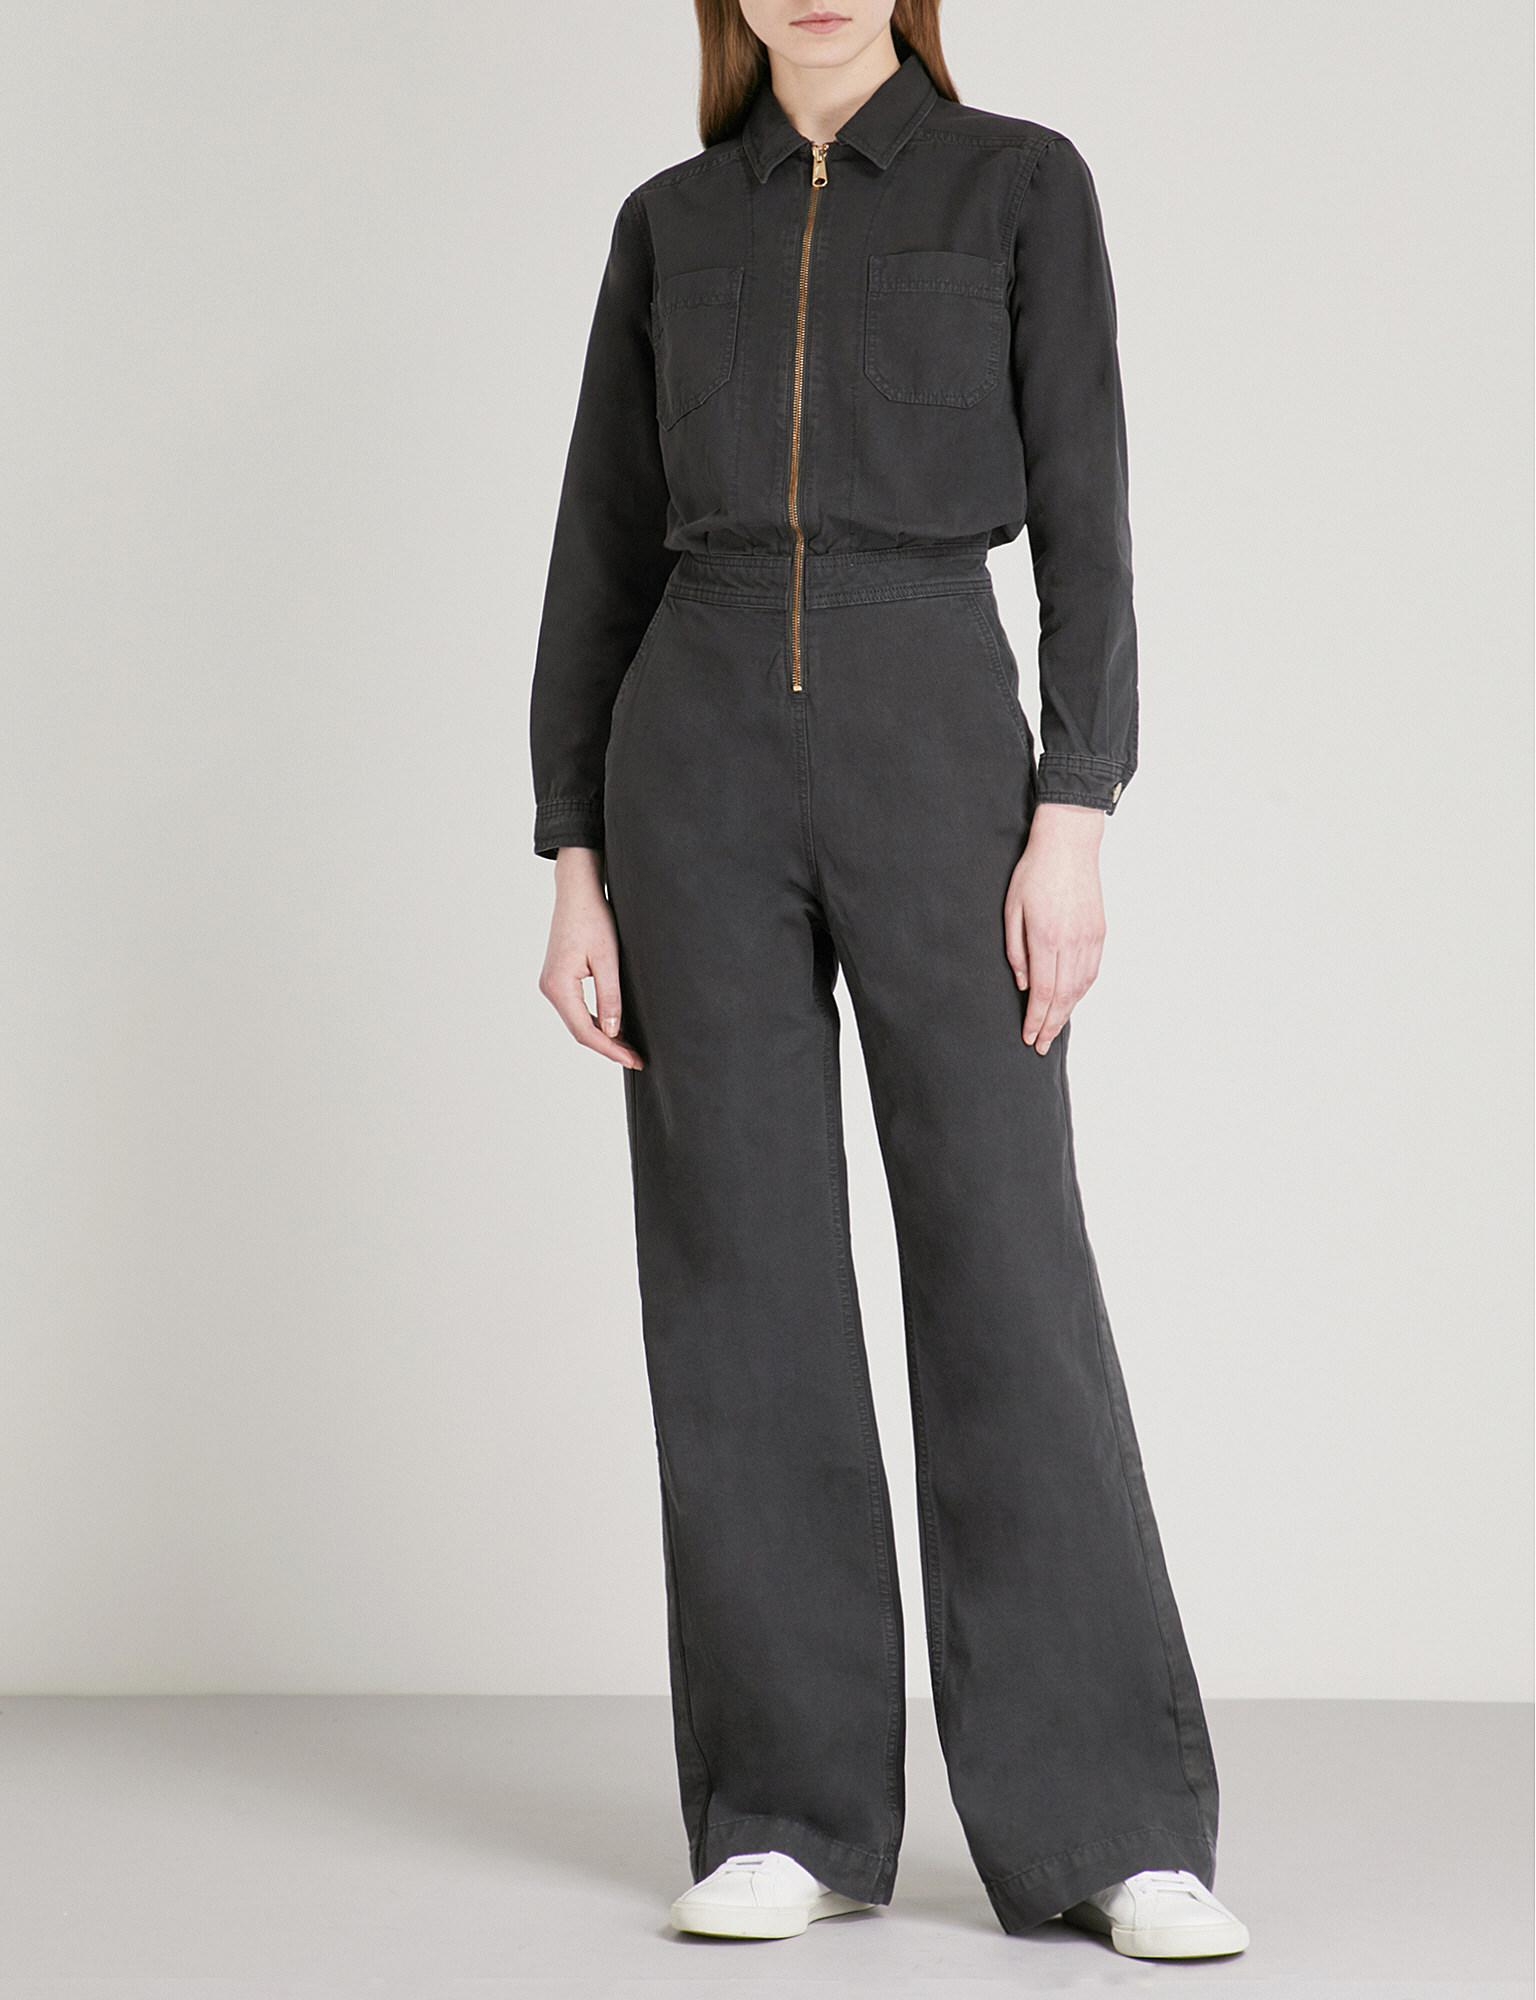 231ca29e446 Lyst - Tommy Hilfiger X Gigi Hadid Cotton Jumpsuit in Gray